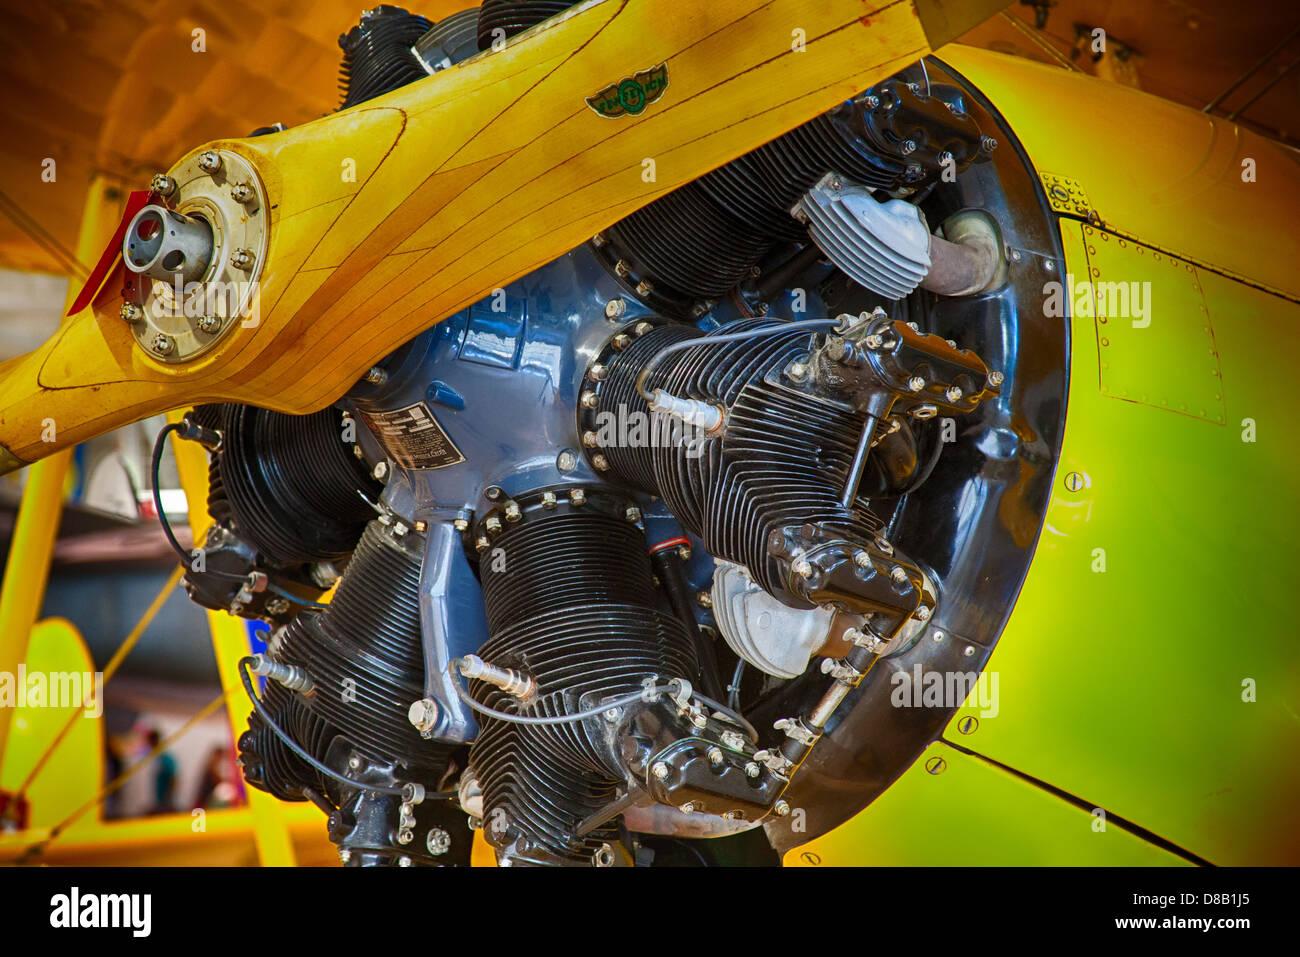 Aircraft propeller engine - Stock Image